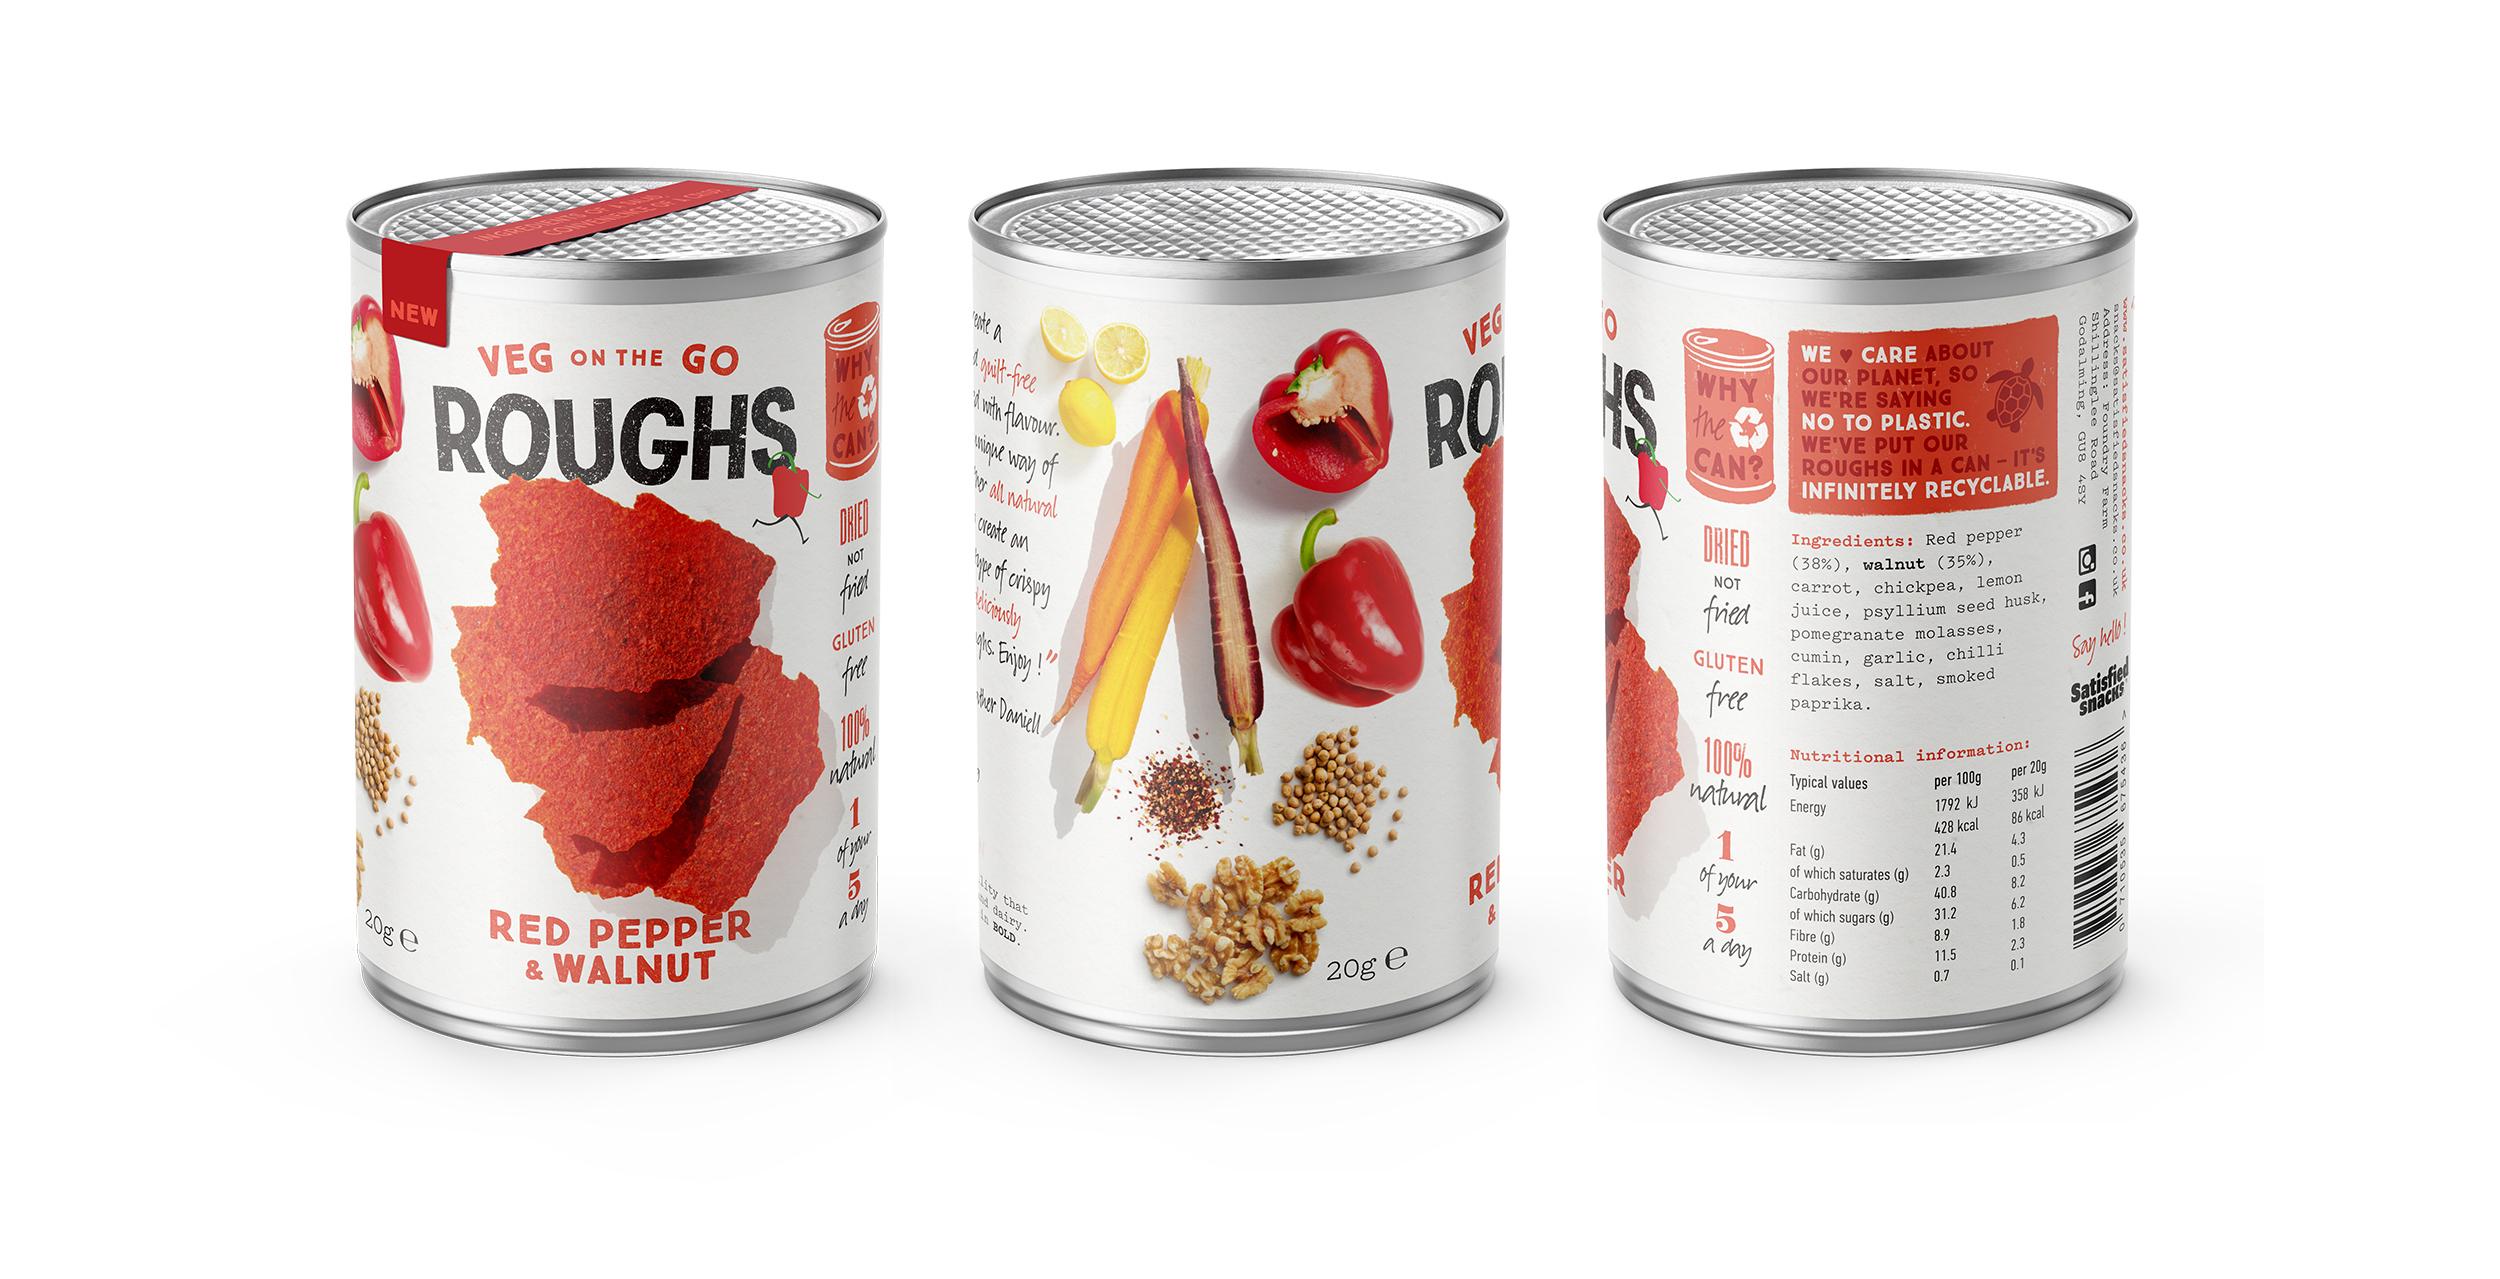 Eco-Packaging-design-London-sustainable-plastic-free-snacks-zero-waste-galia-rybitskaya-a-ya-design-satisfied-snacks-roughs-red-pepper-and-goats-cheese.jpg